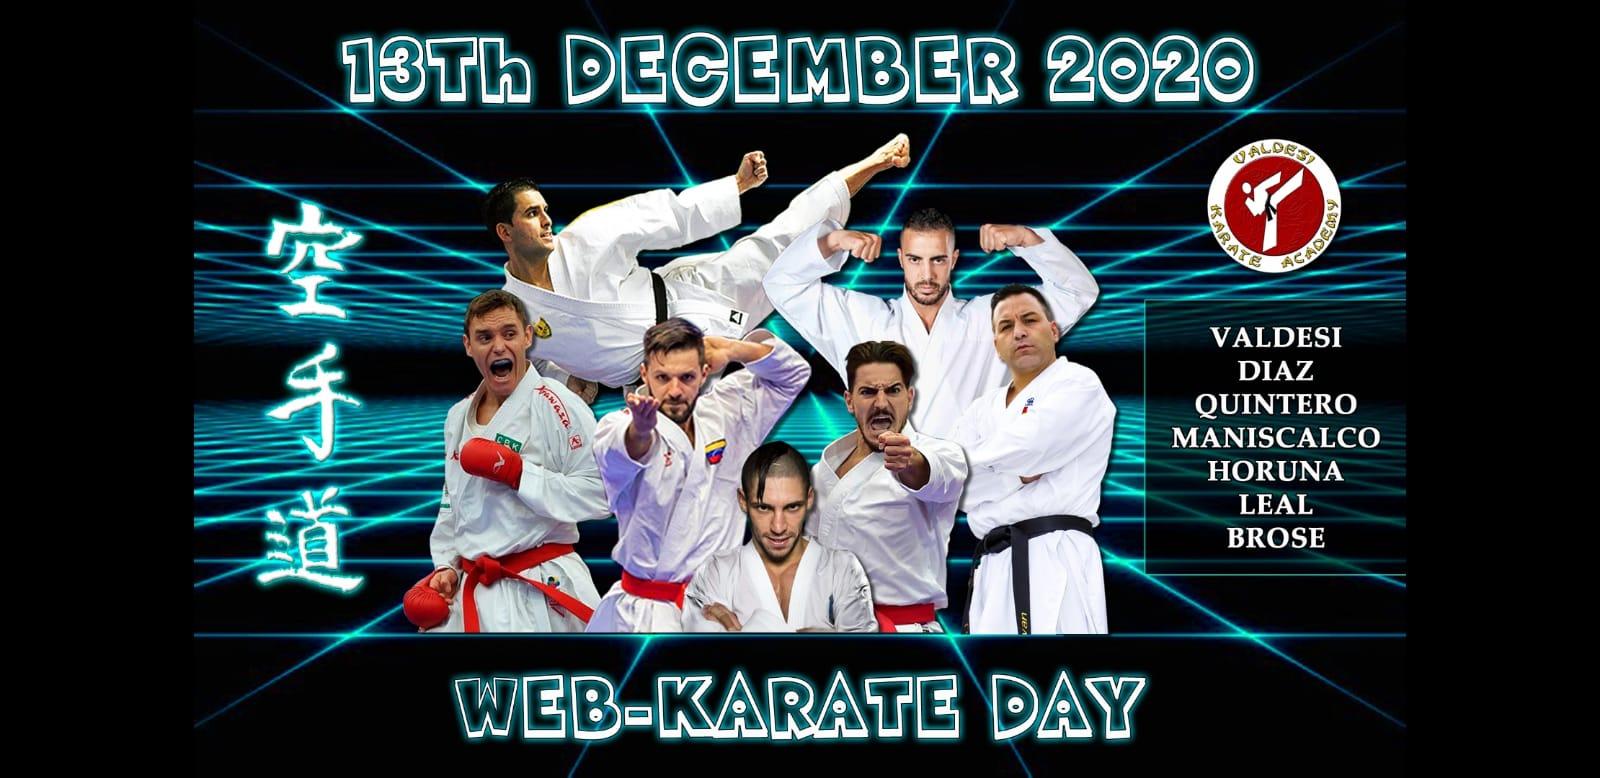 Web Karate Day - Session Kata - Valdesi